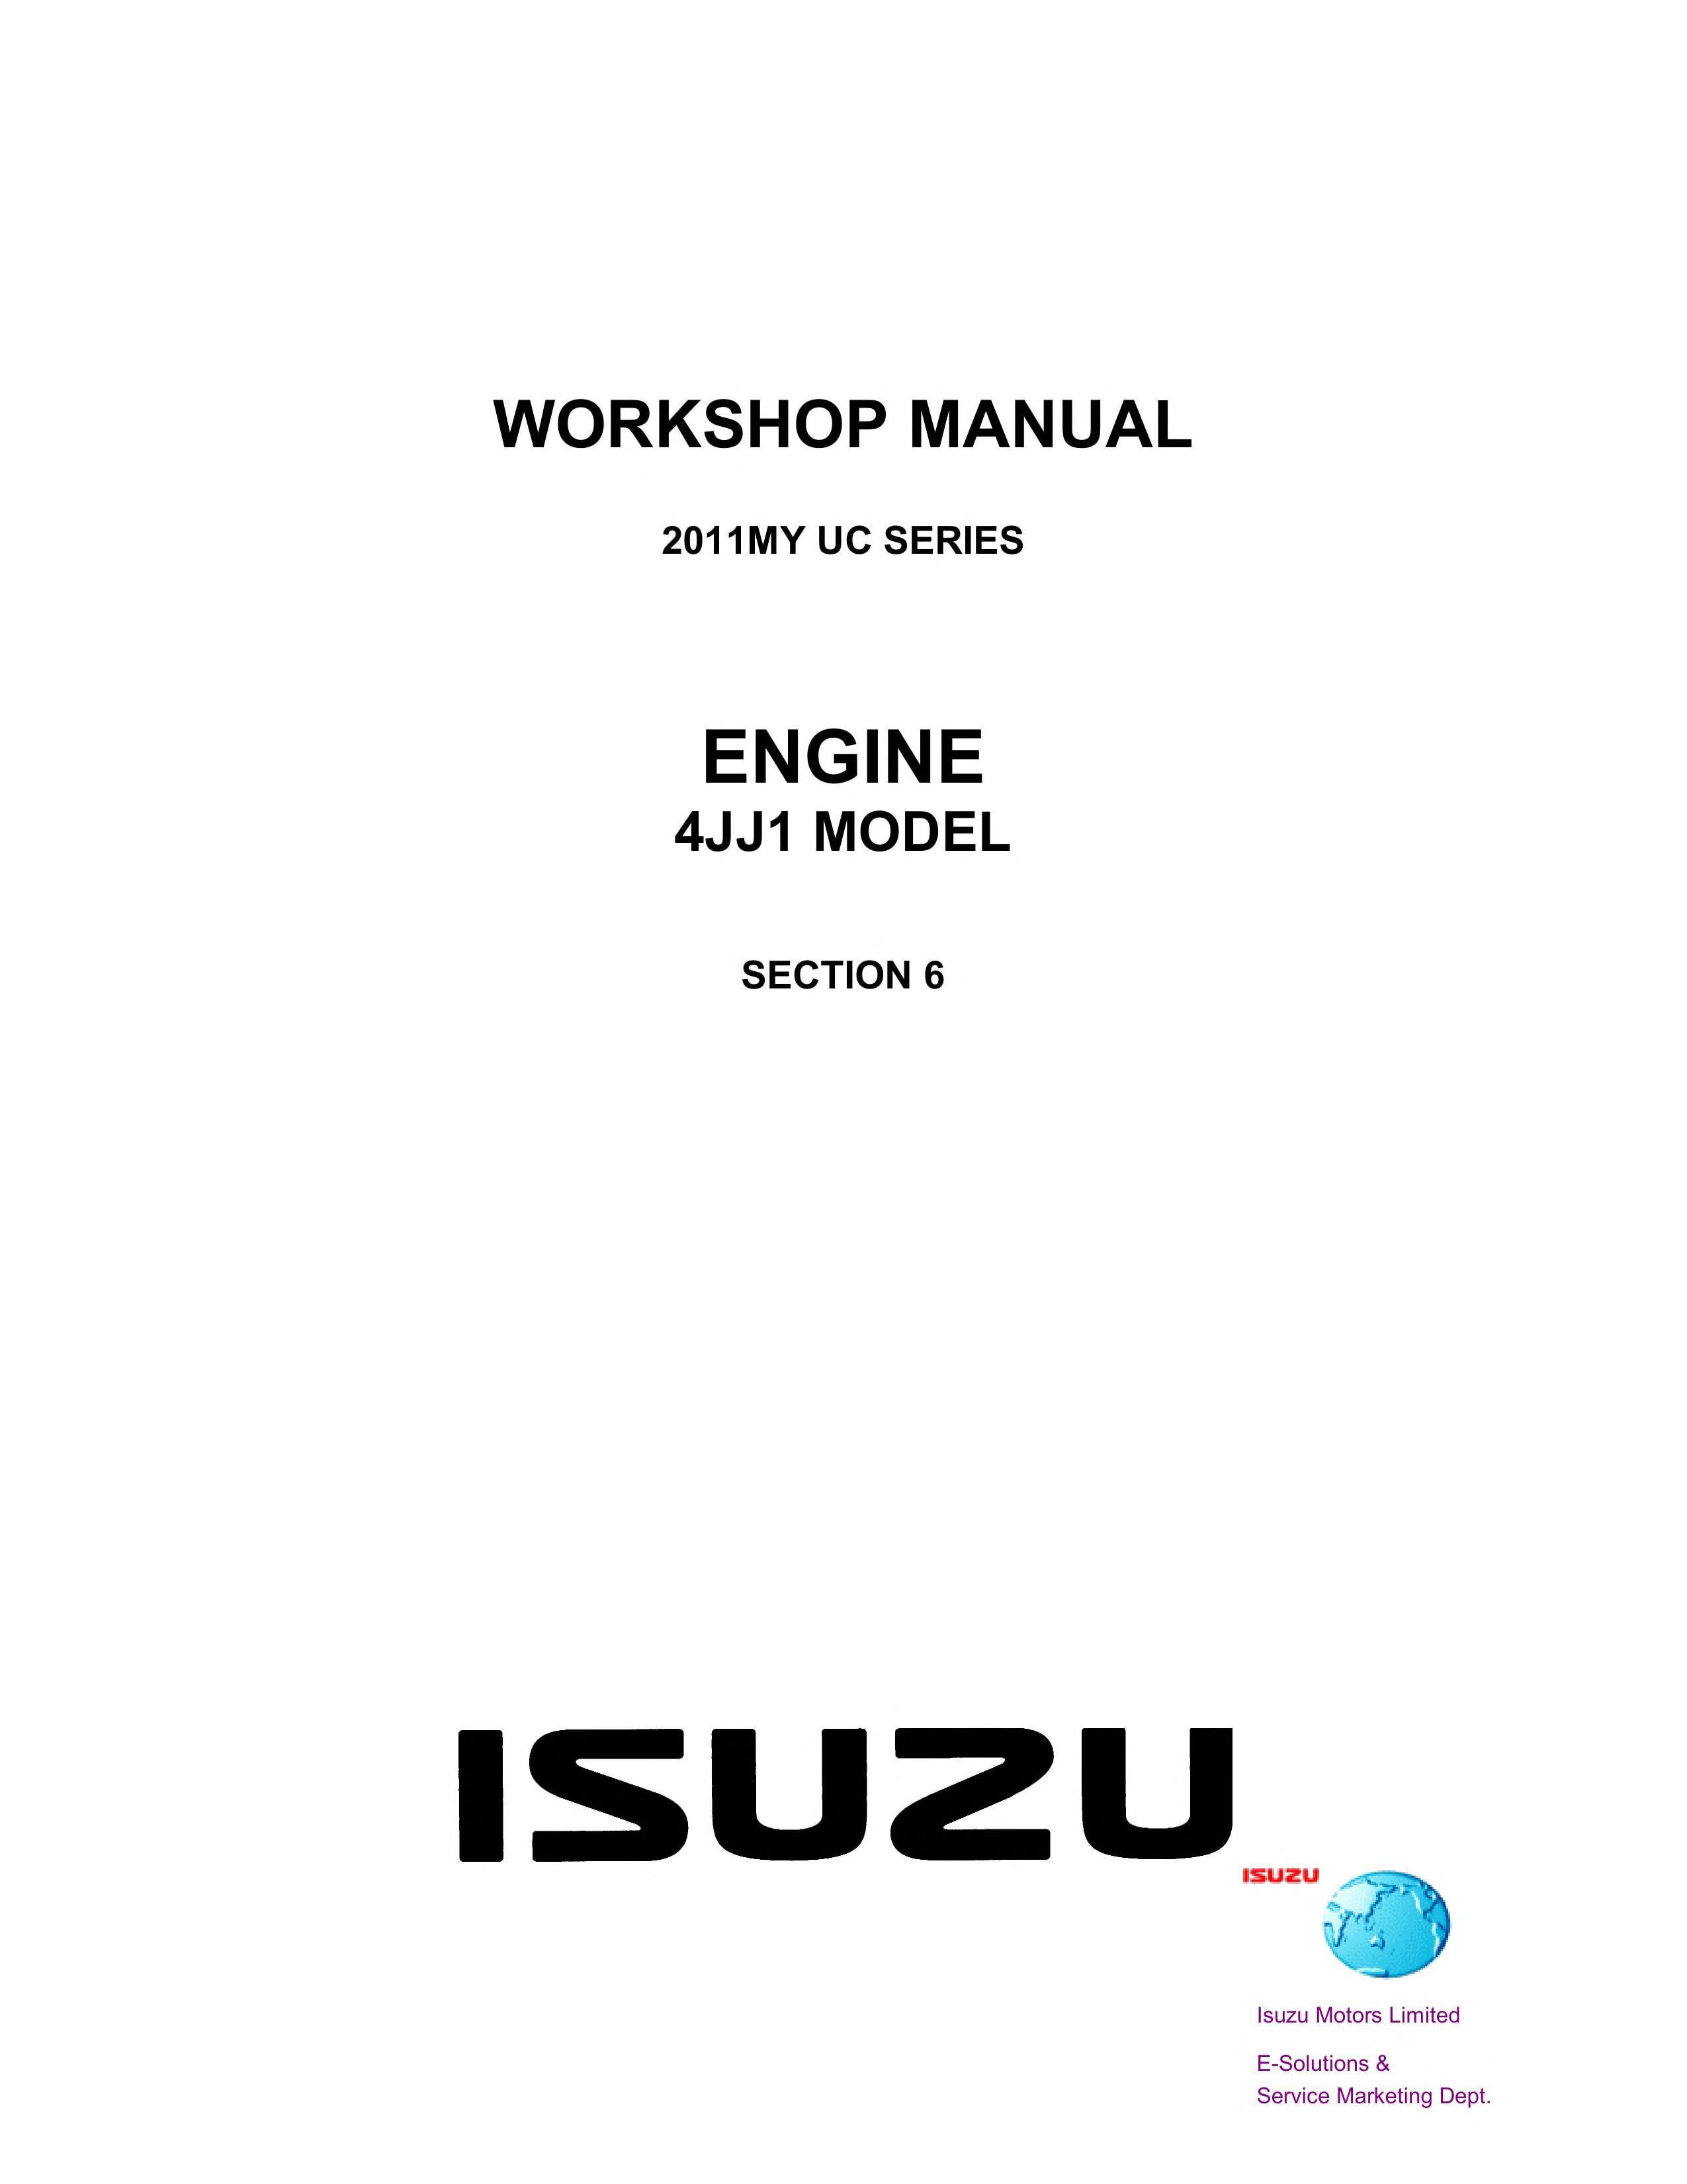 medium resolution of isuzu d max 2011 4jj1 engine service manual pdf pdfy mirror free download borrow and streaming internet archive